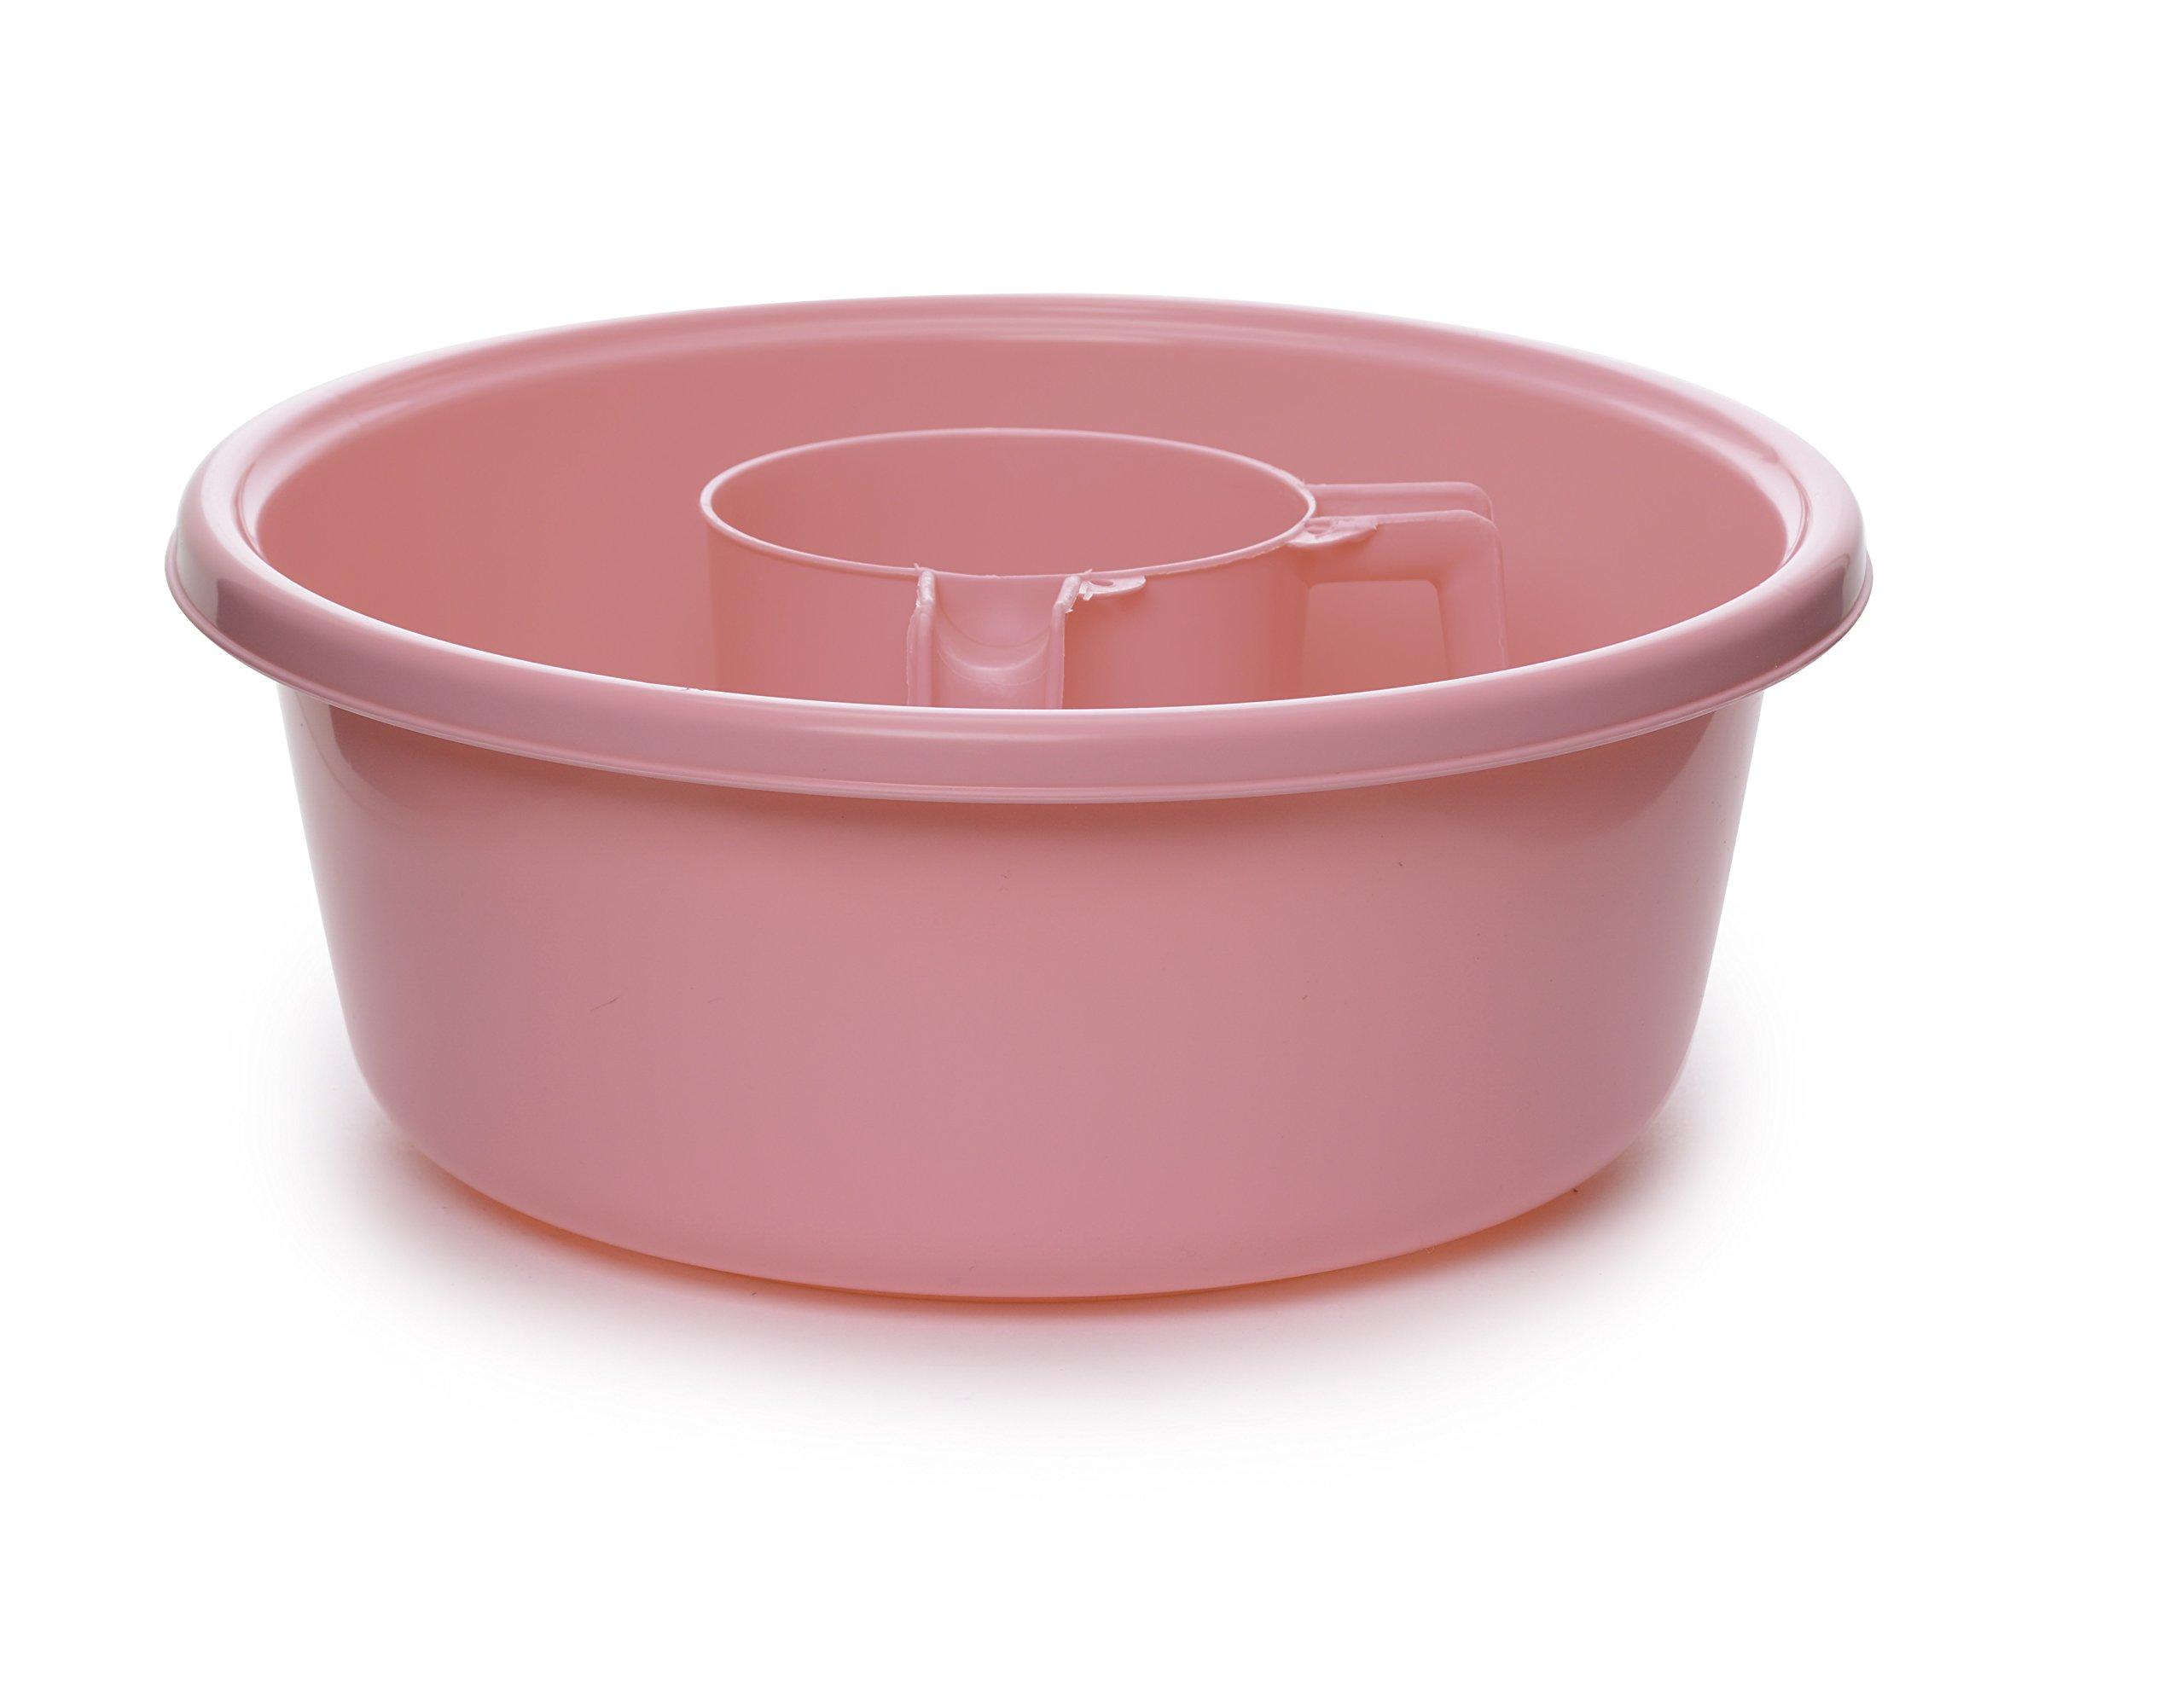 YBM Home Square Wash Cup & Round Wash Basin Netilat Yadayim, Negel Vasser Set Ba154-1148set-pink (1, pink)